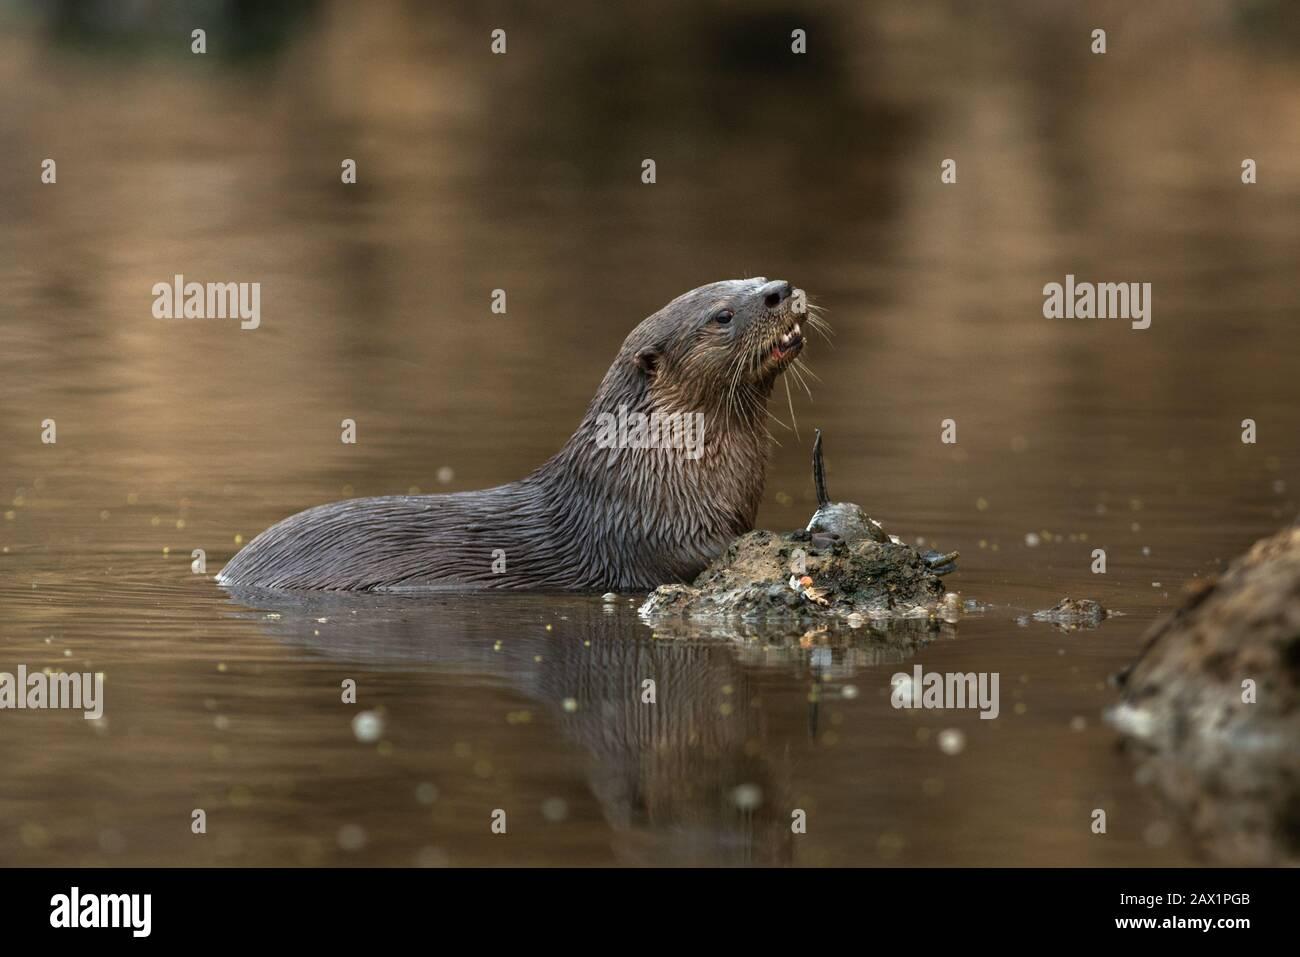 Un Otter di fiume Neotropical (Lontra longicaudis) da Pantanal sud, Brasile Foto Stock